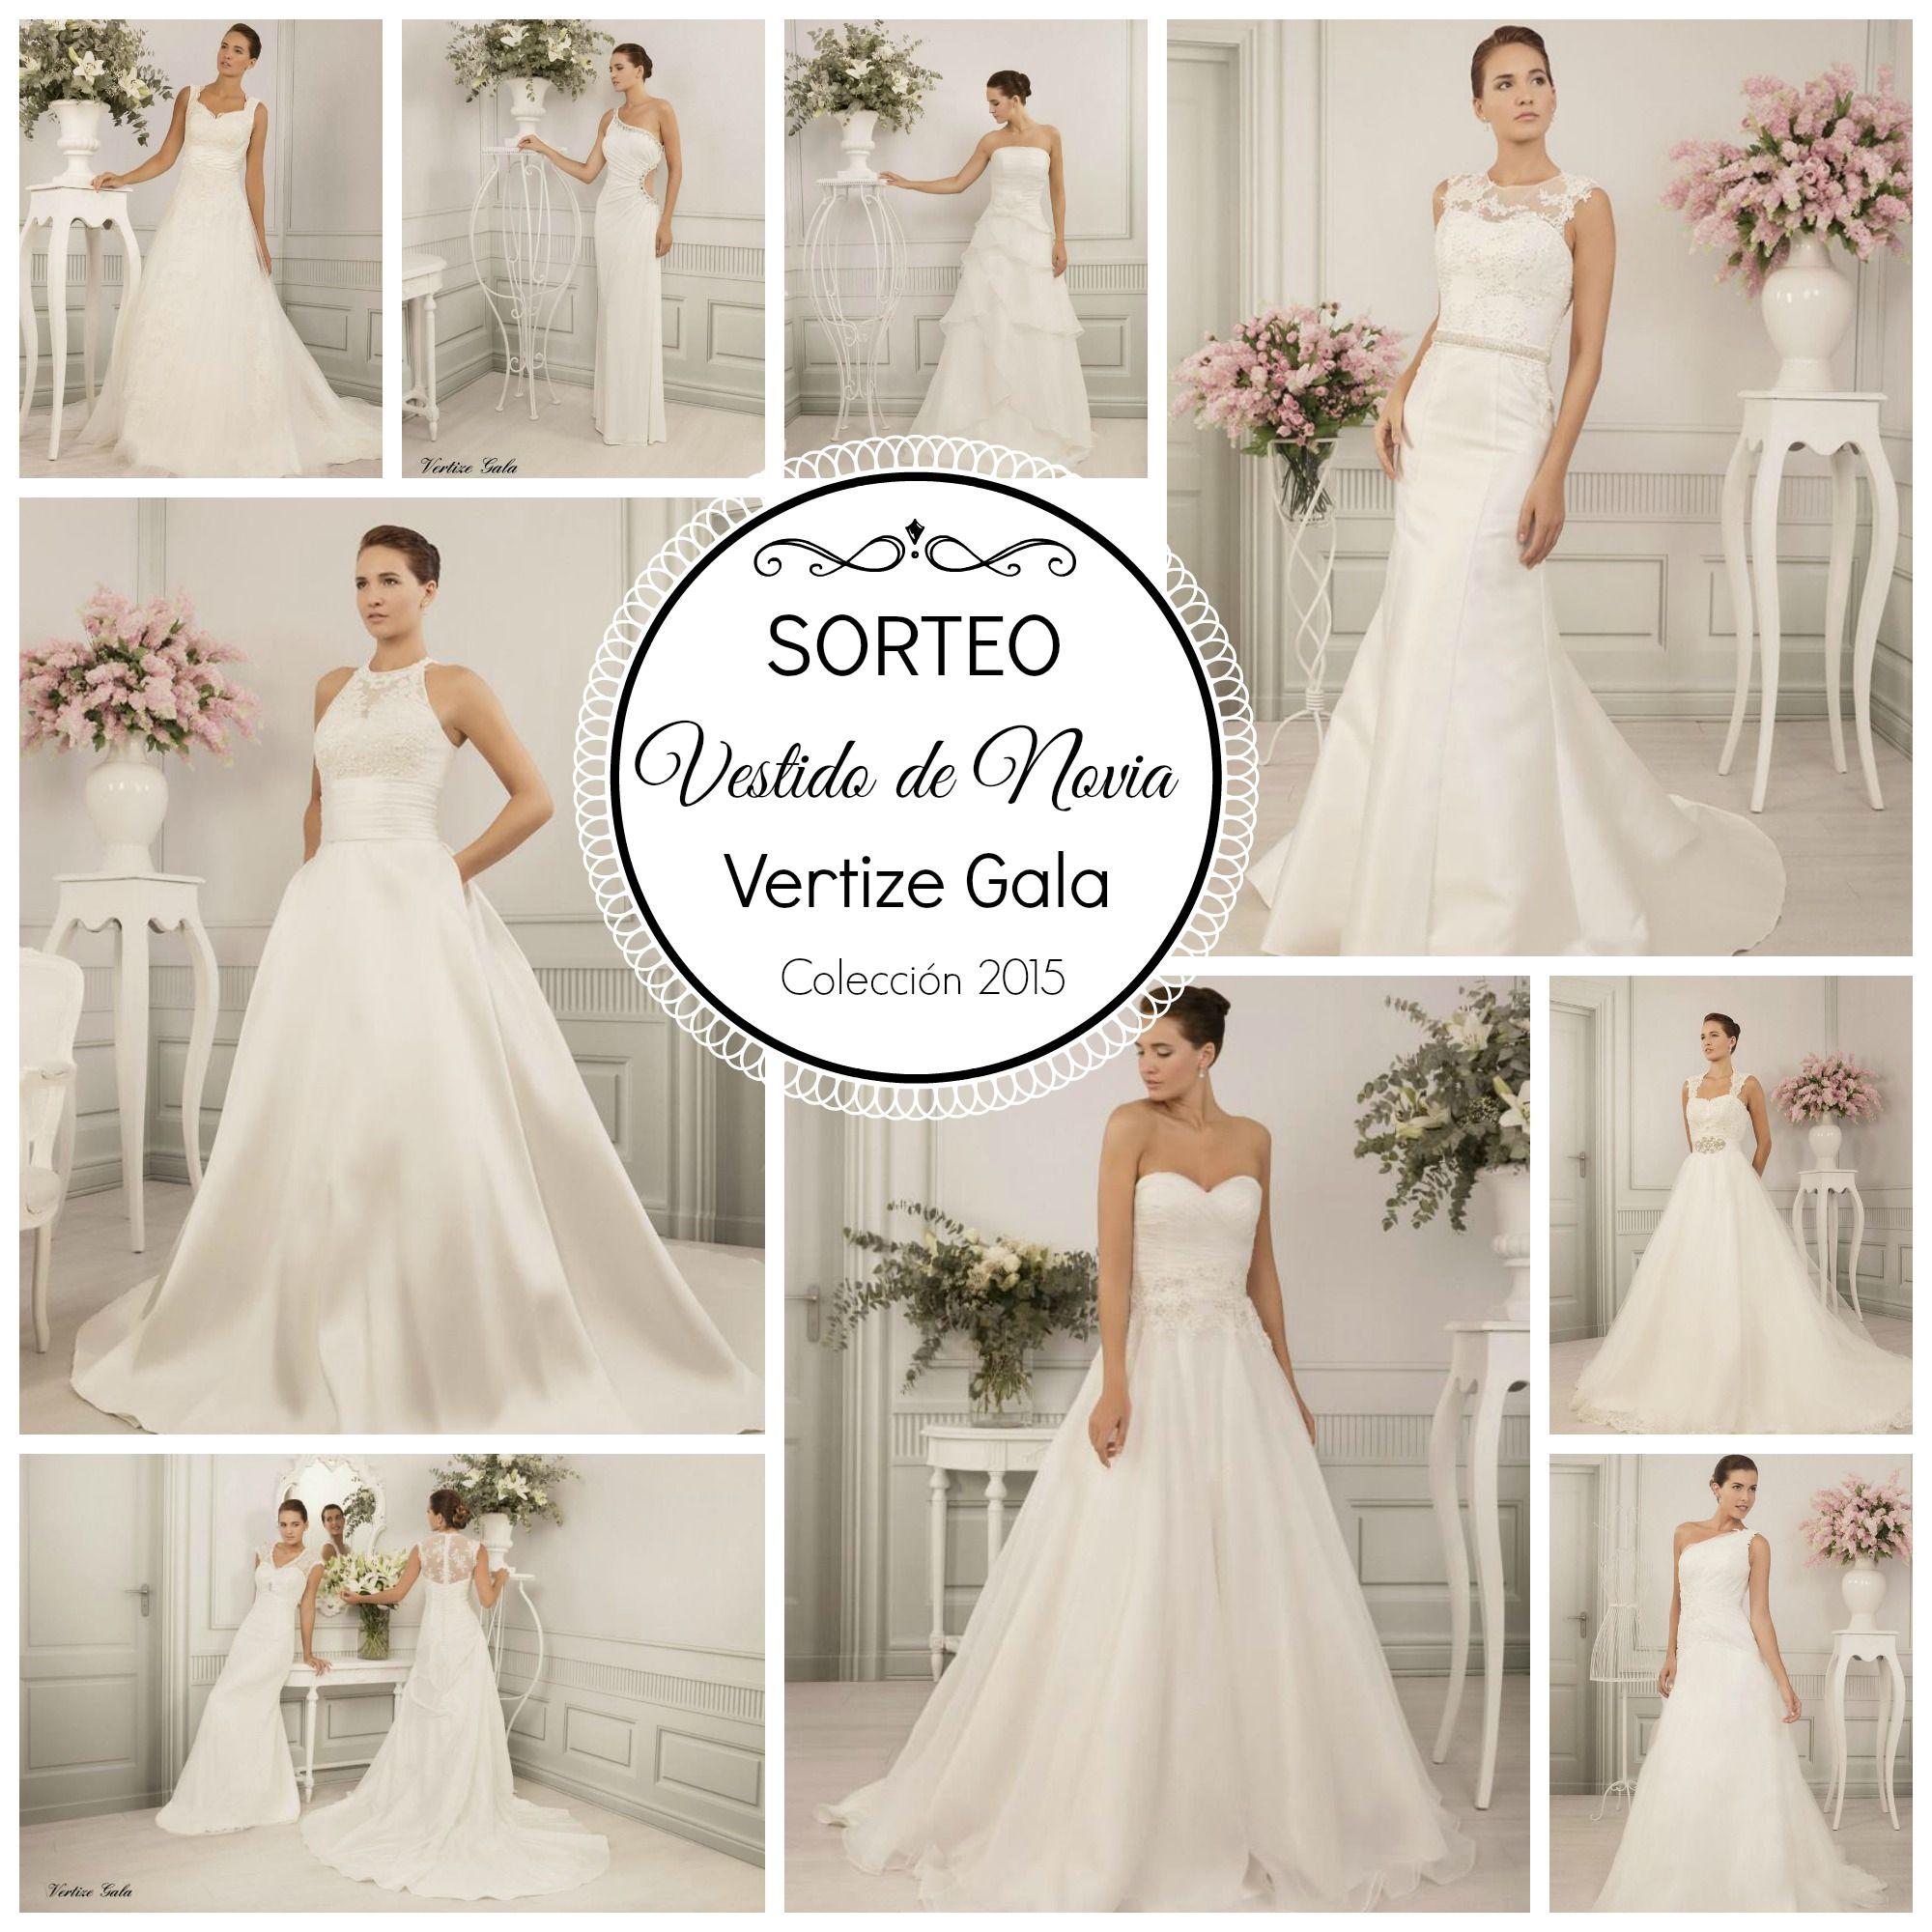 colores para decoracion de bodas 2015 de noche - Buscar con Google